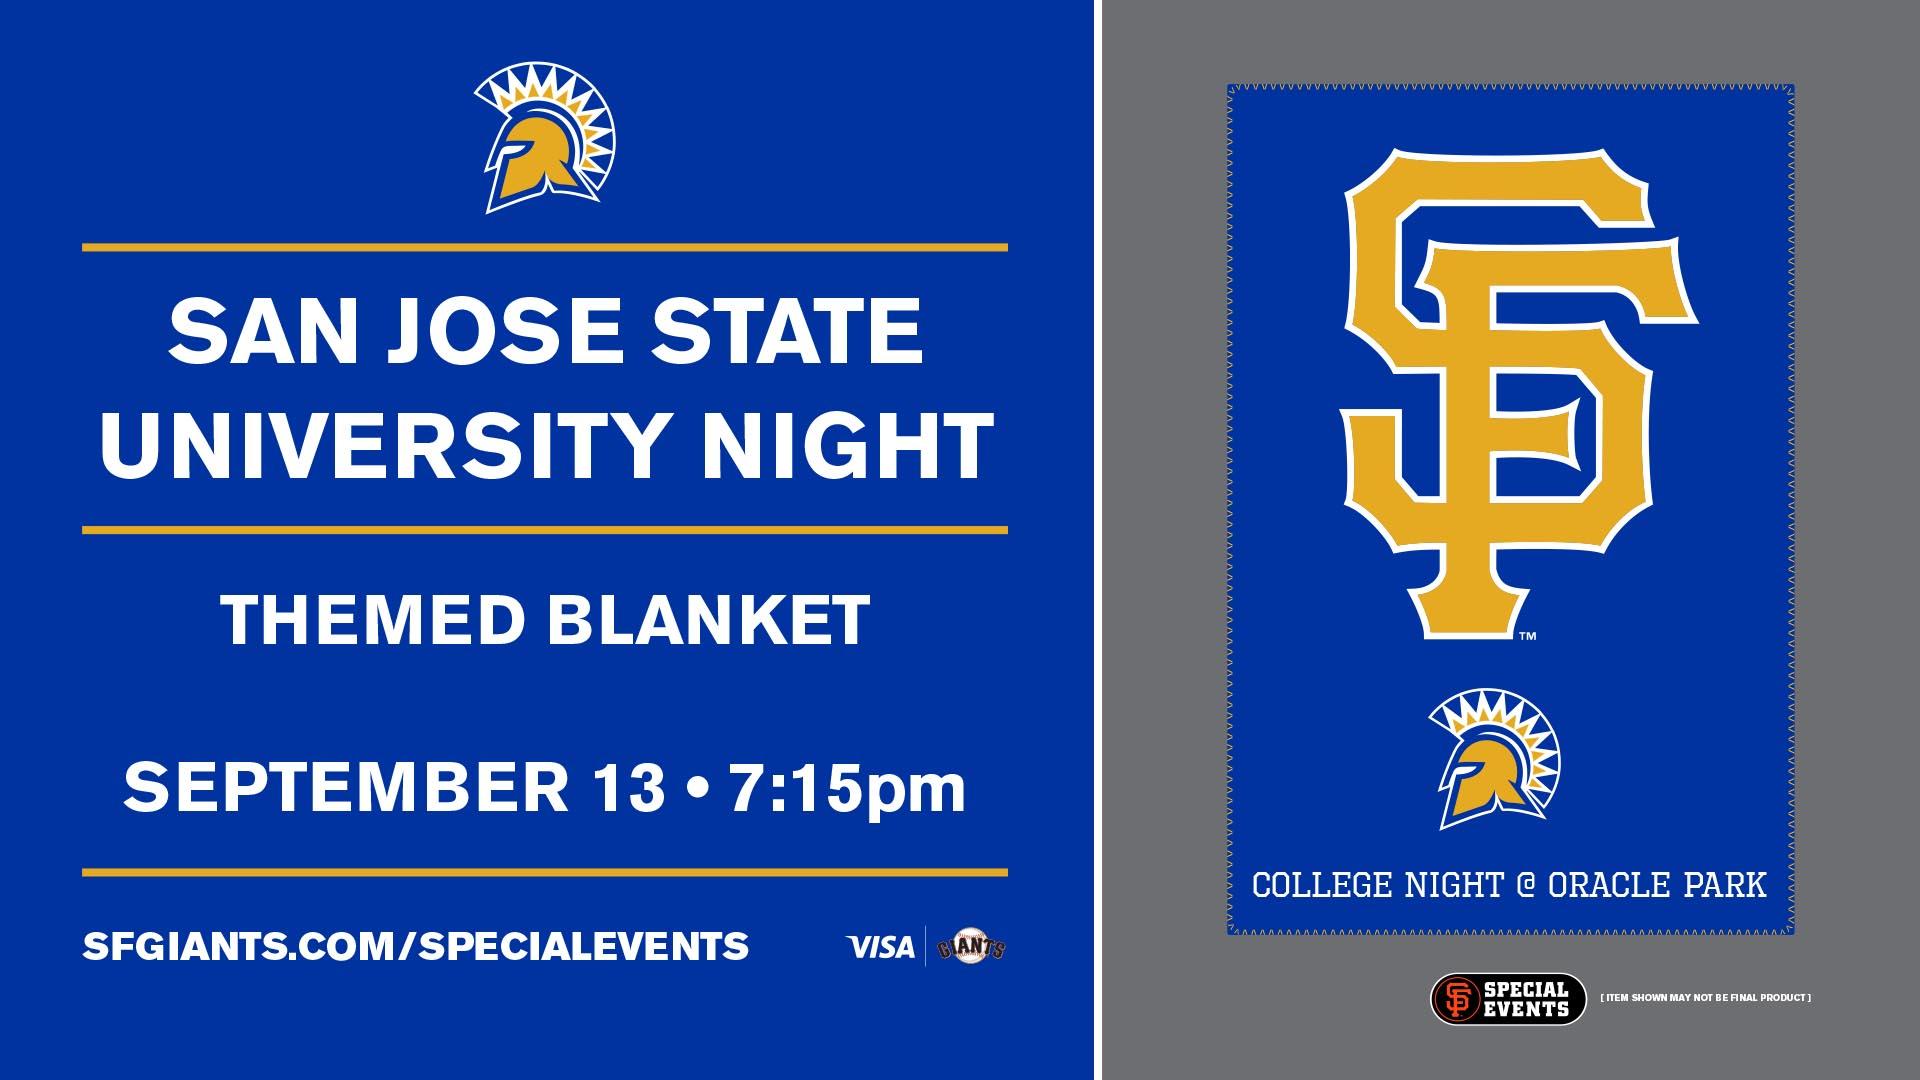 Special Event San Jose State University Night San Francisco Giants